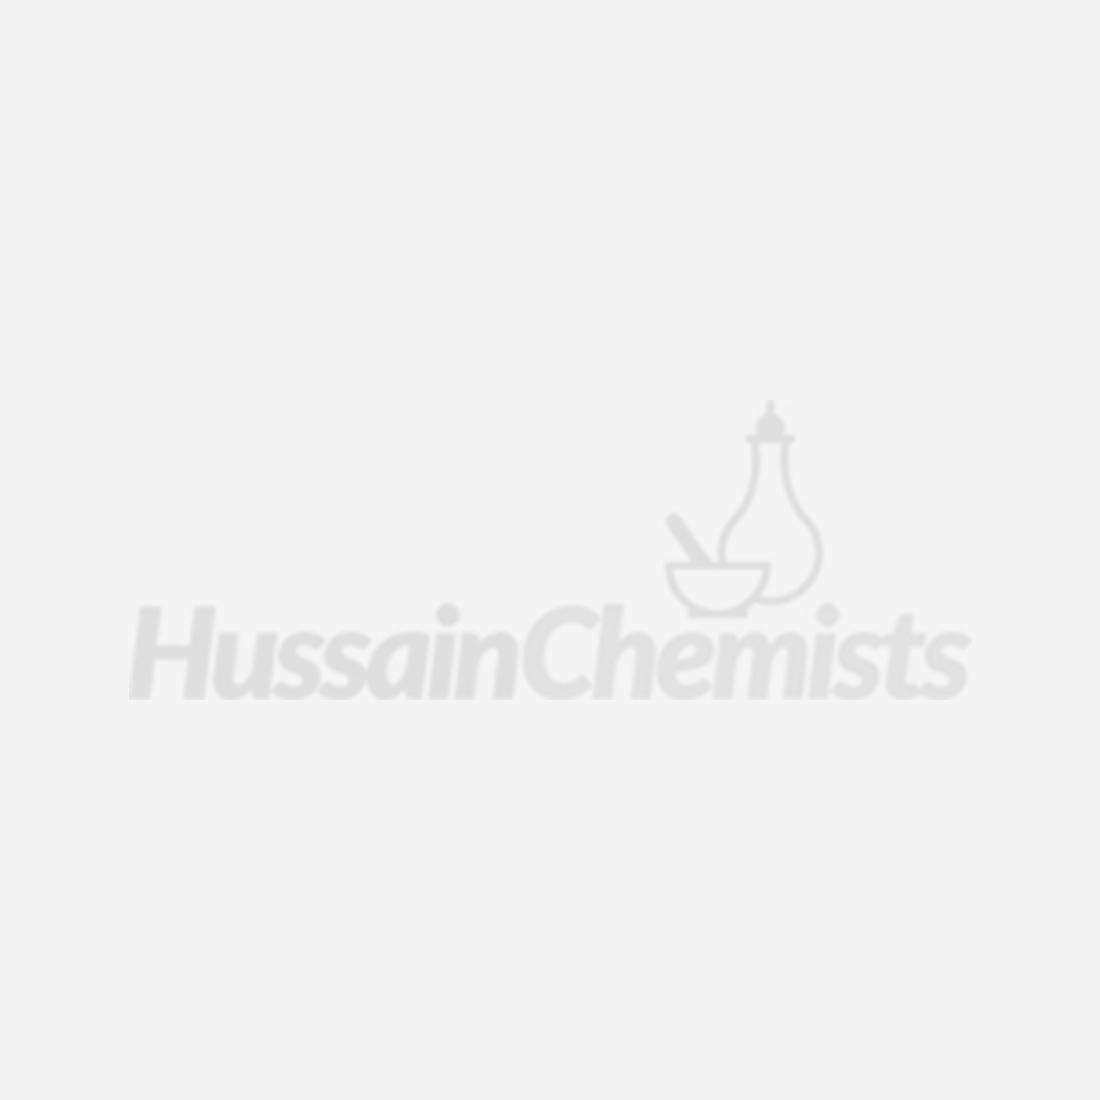 Ultra Chloraseptic Anaesthetic Throat Spray Blackcurrant Flavour 15ml- 100 sprays